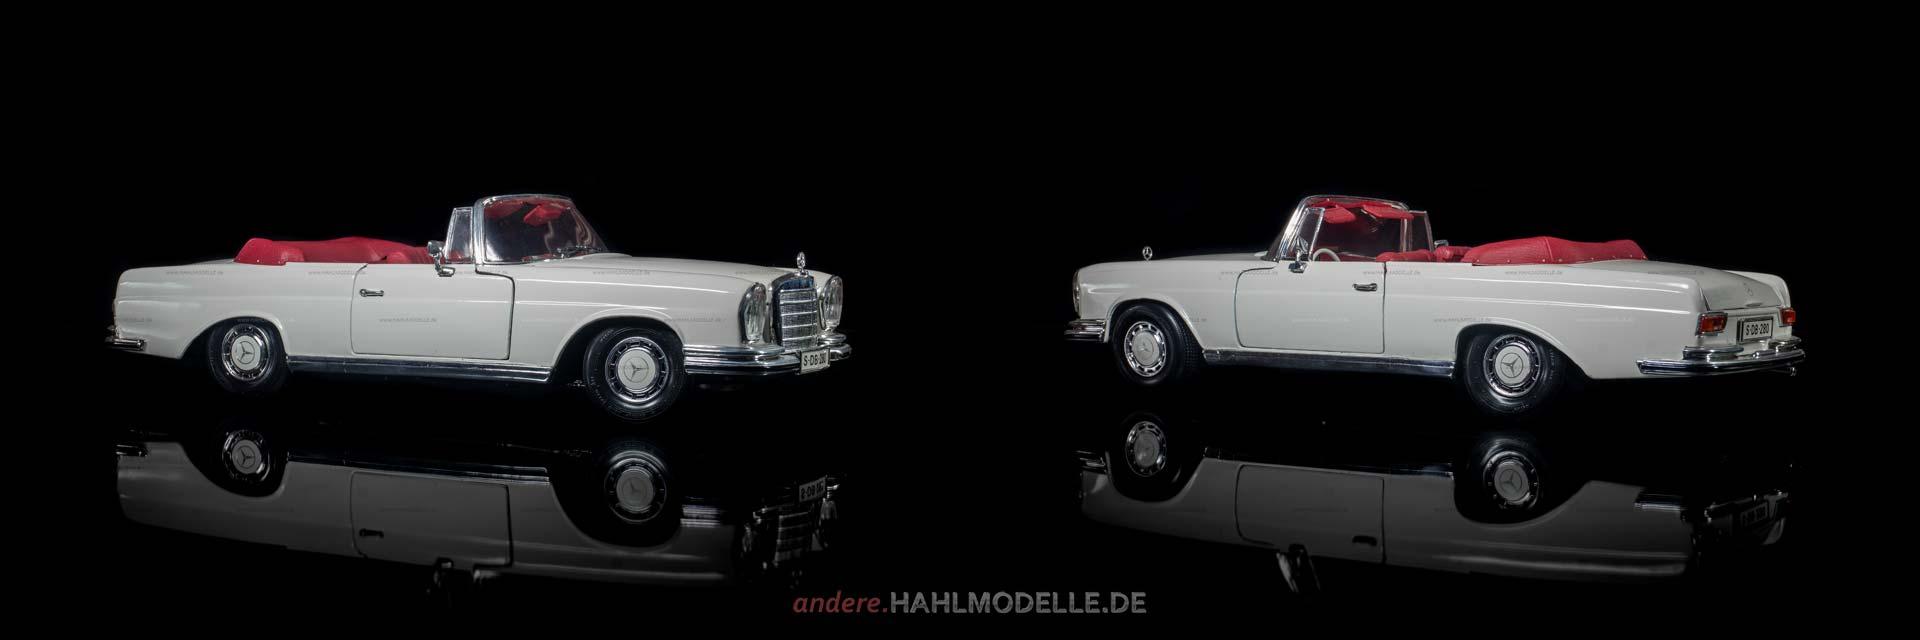 Mercedes-Benz 280 SE (W 111/C) | Cabriolet | Maisto | www.andere.hahlmodelle.de